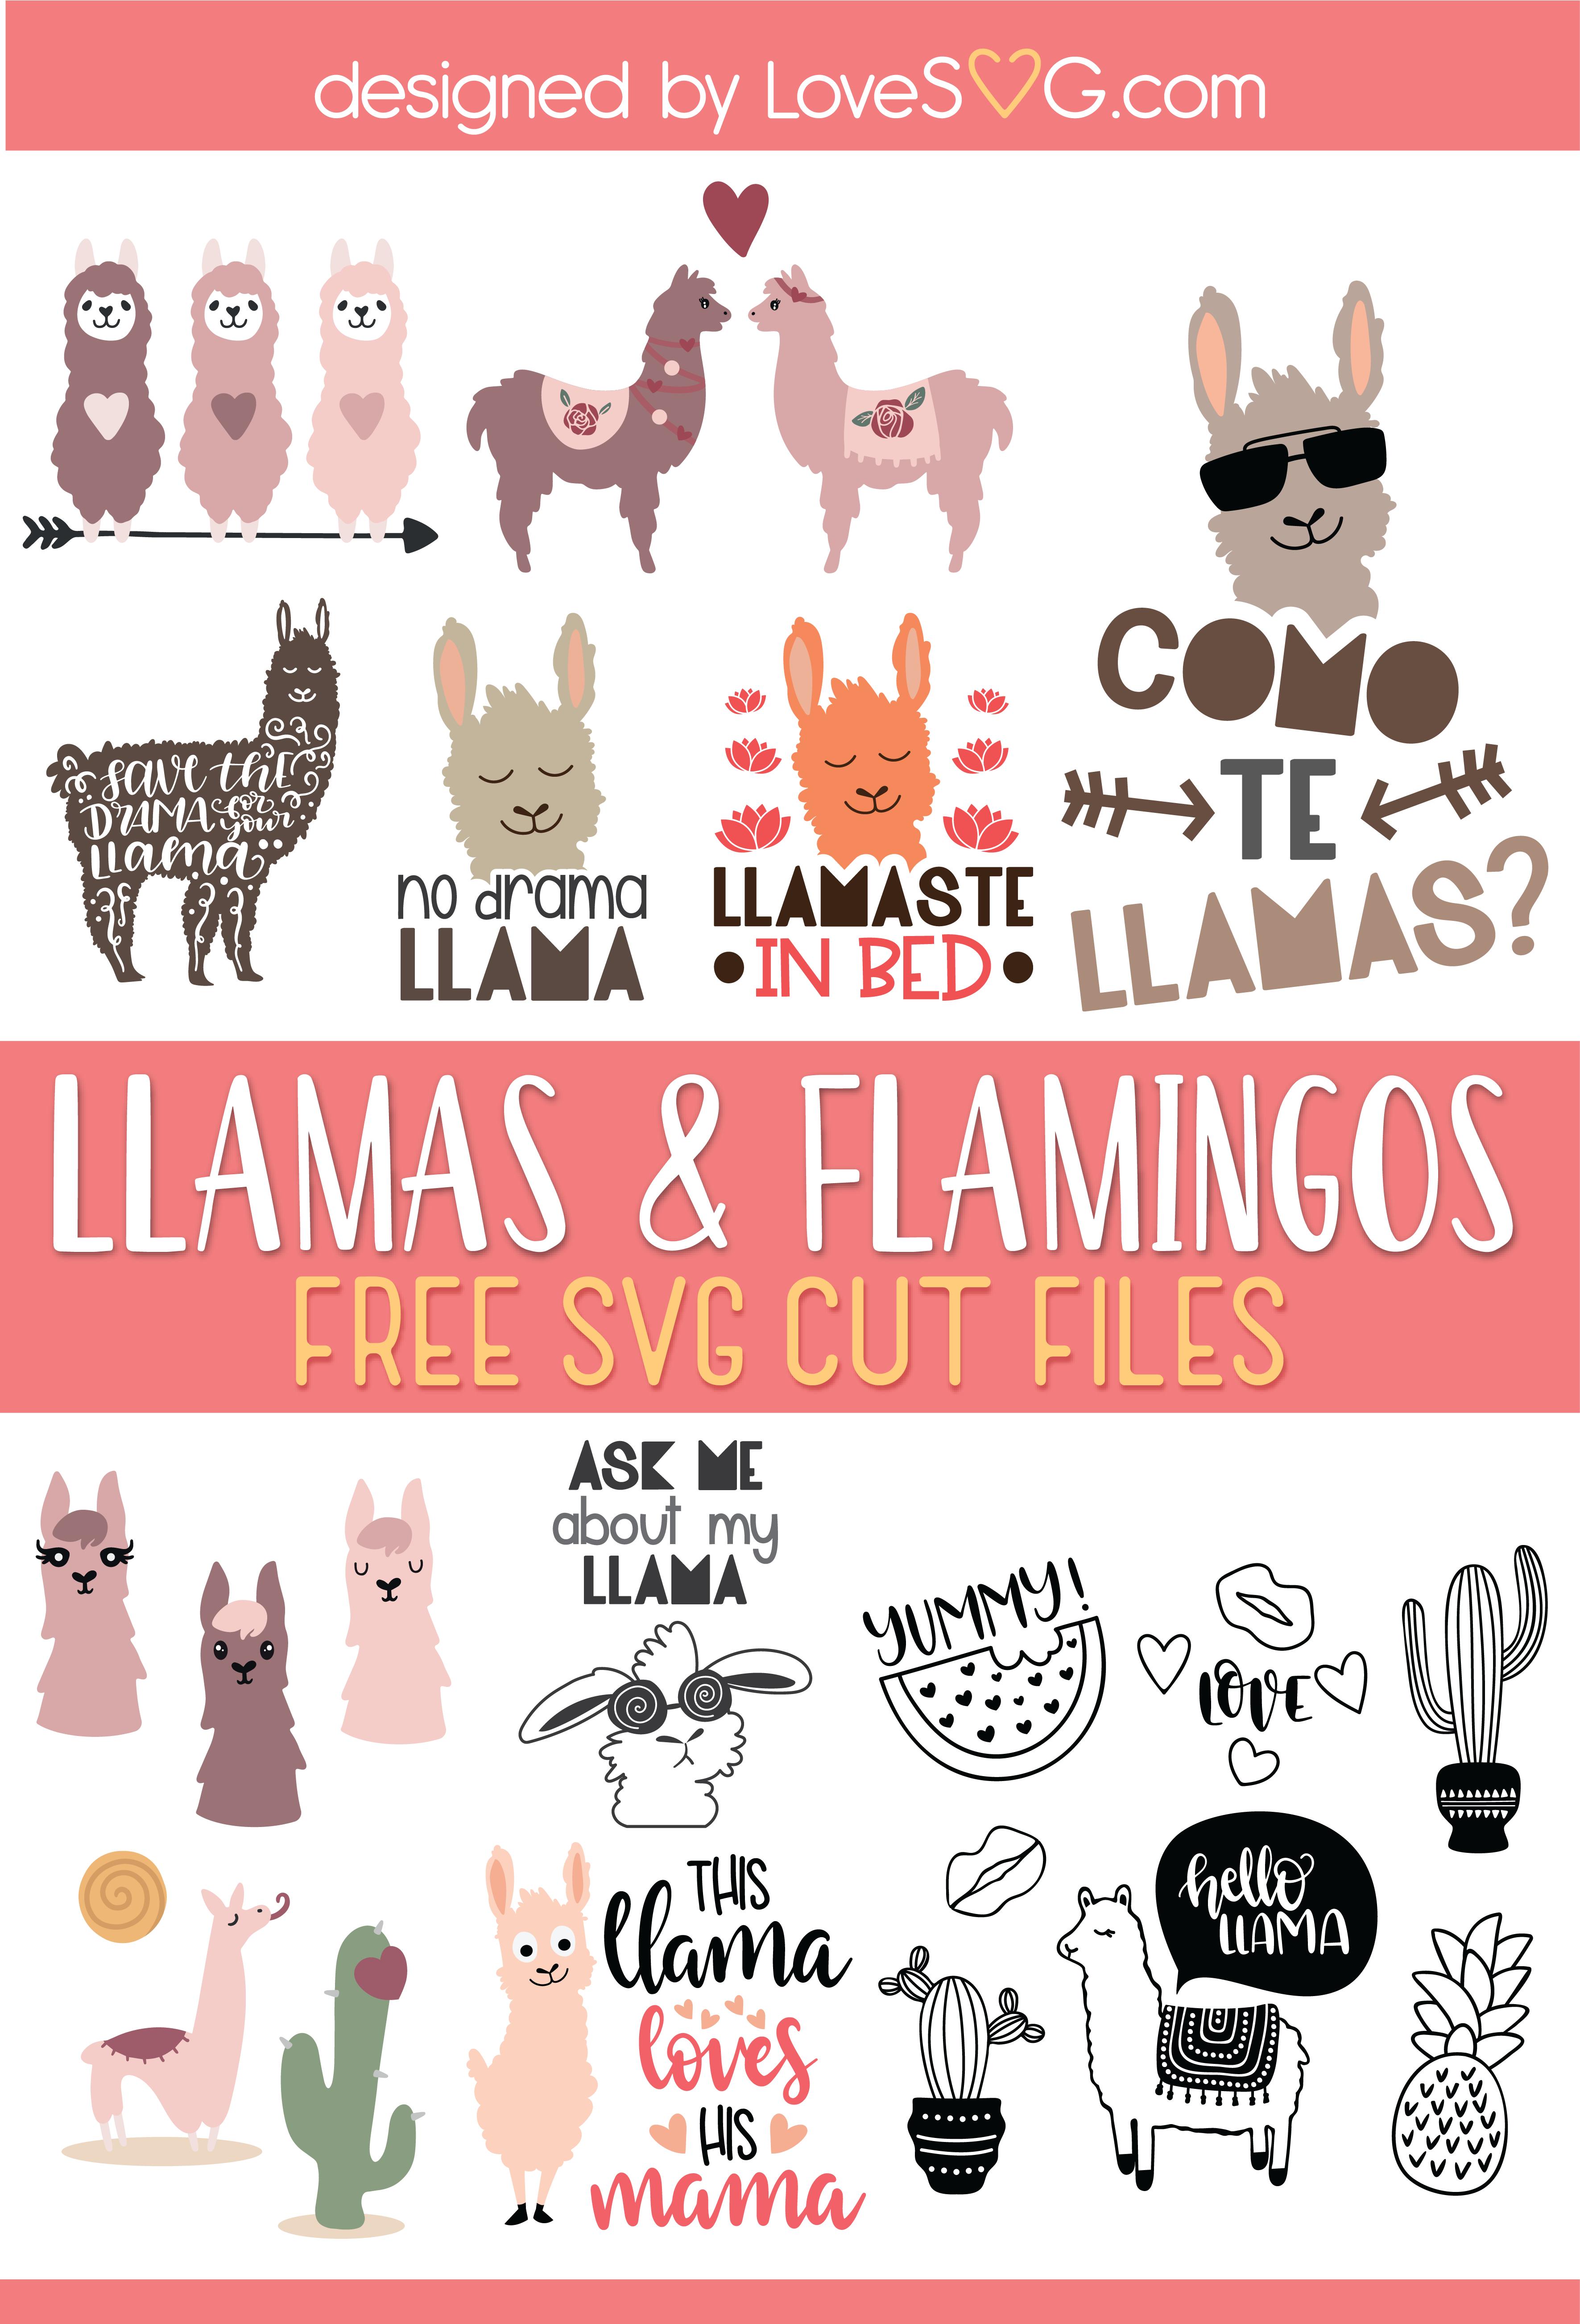 Free Llamas, Flamingos, and Elephants SVG Cut Files